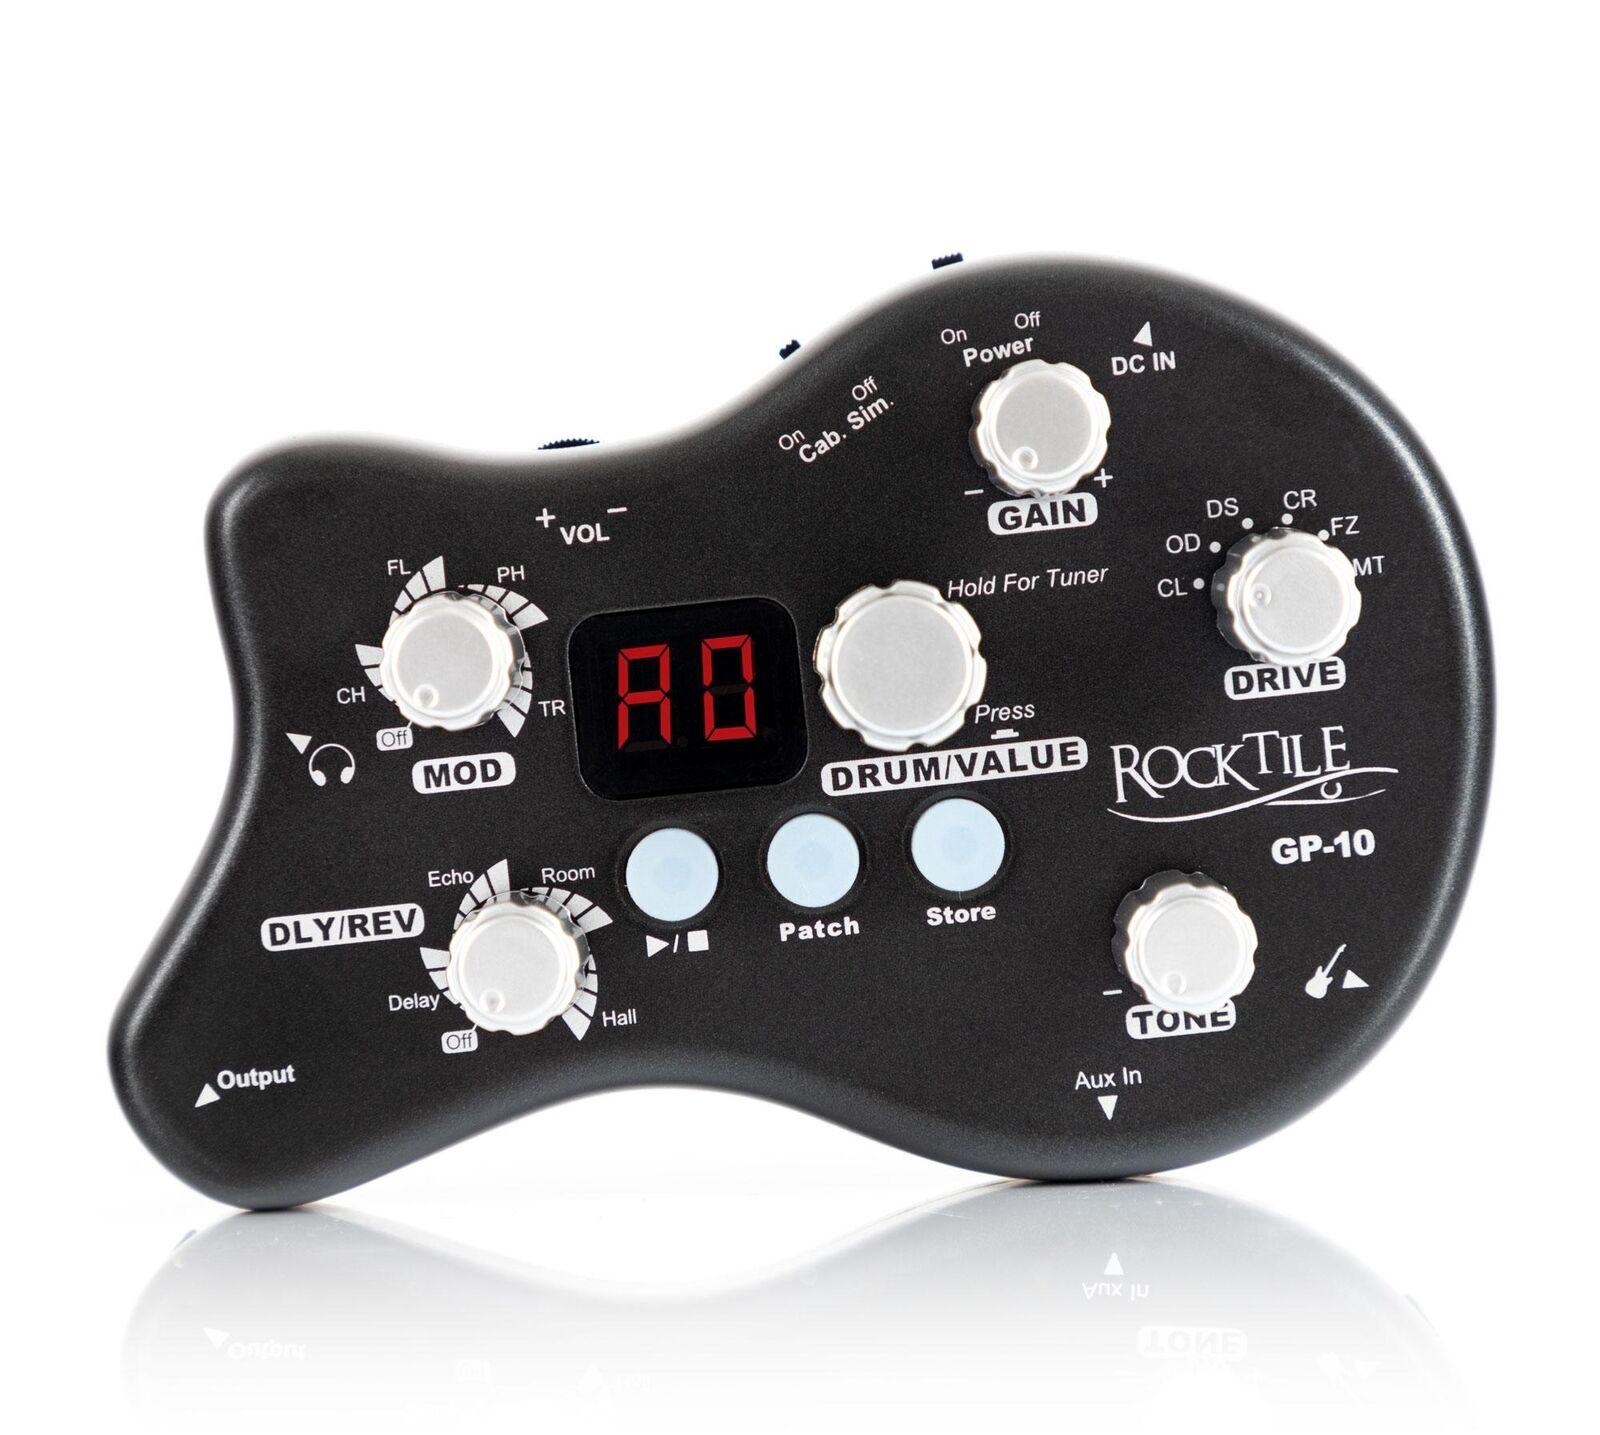 AMPLIFICATEUR ECOUTEUR AMPLI MULTIEFFET GUITARE ELECTRIQUE E-GUITAR PORTABLE AAA